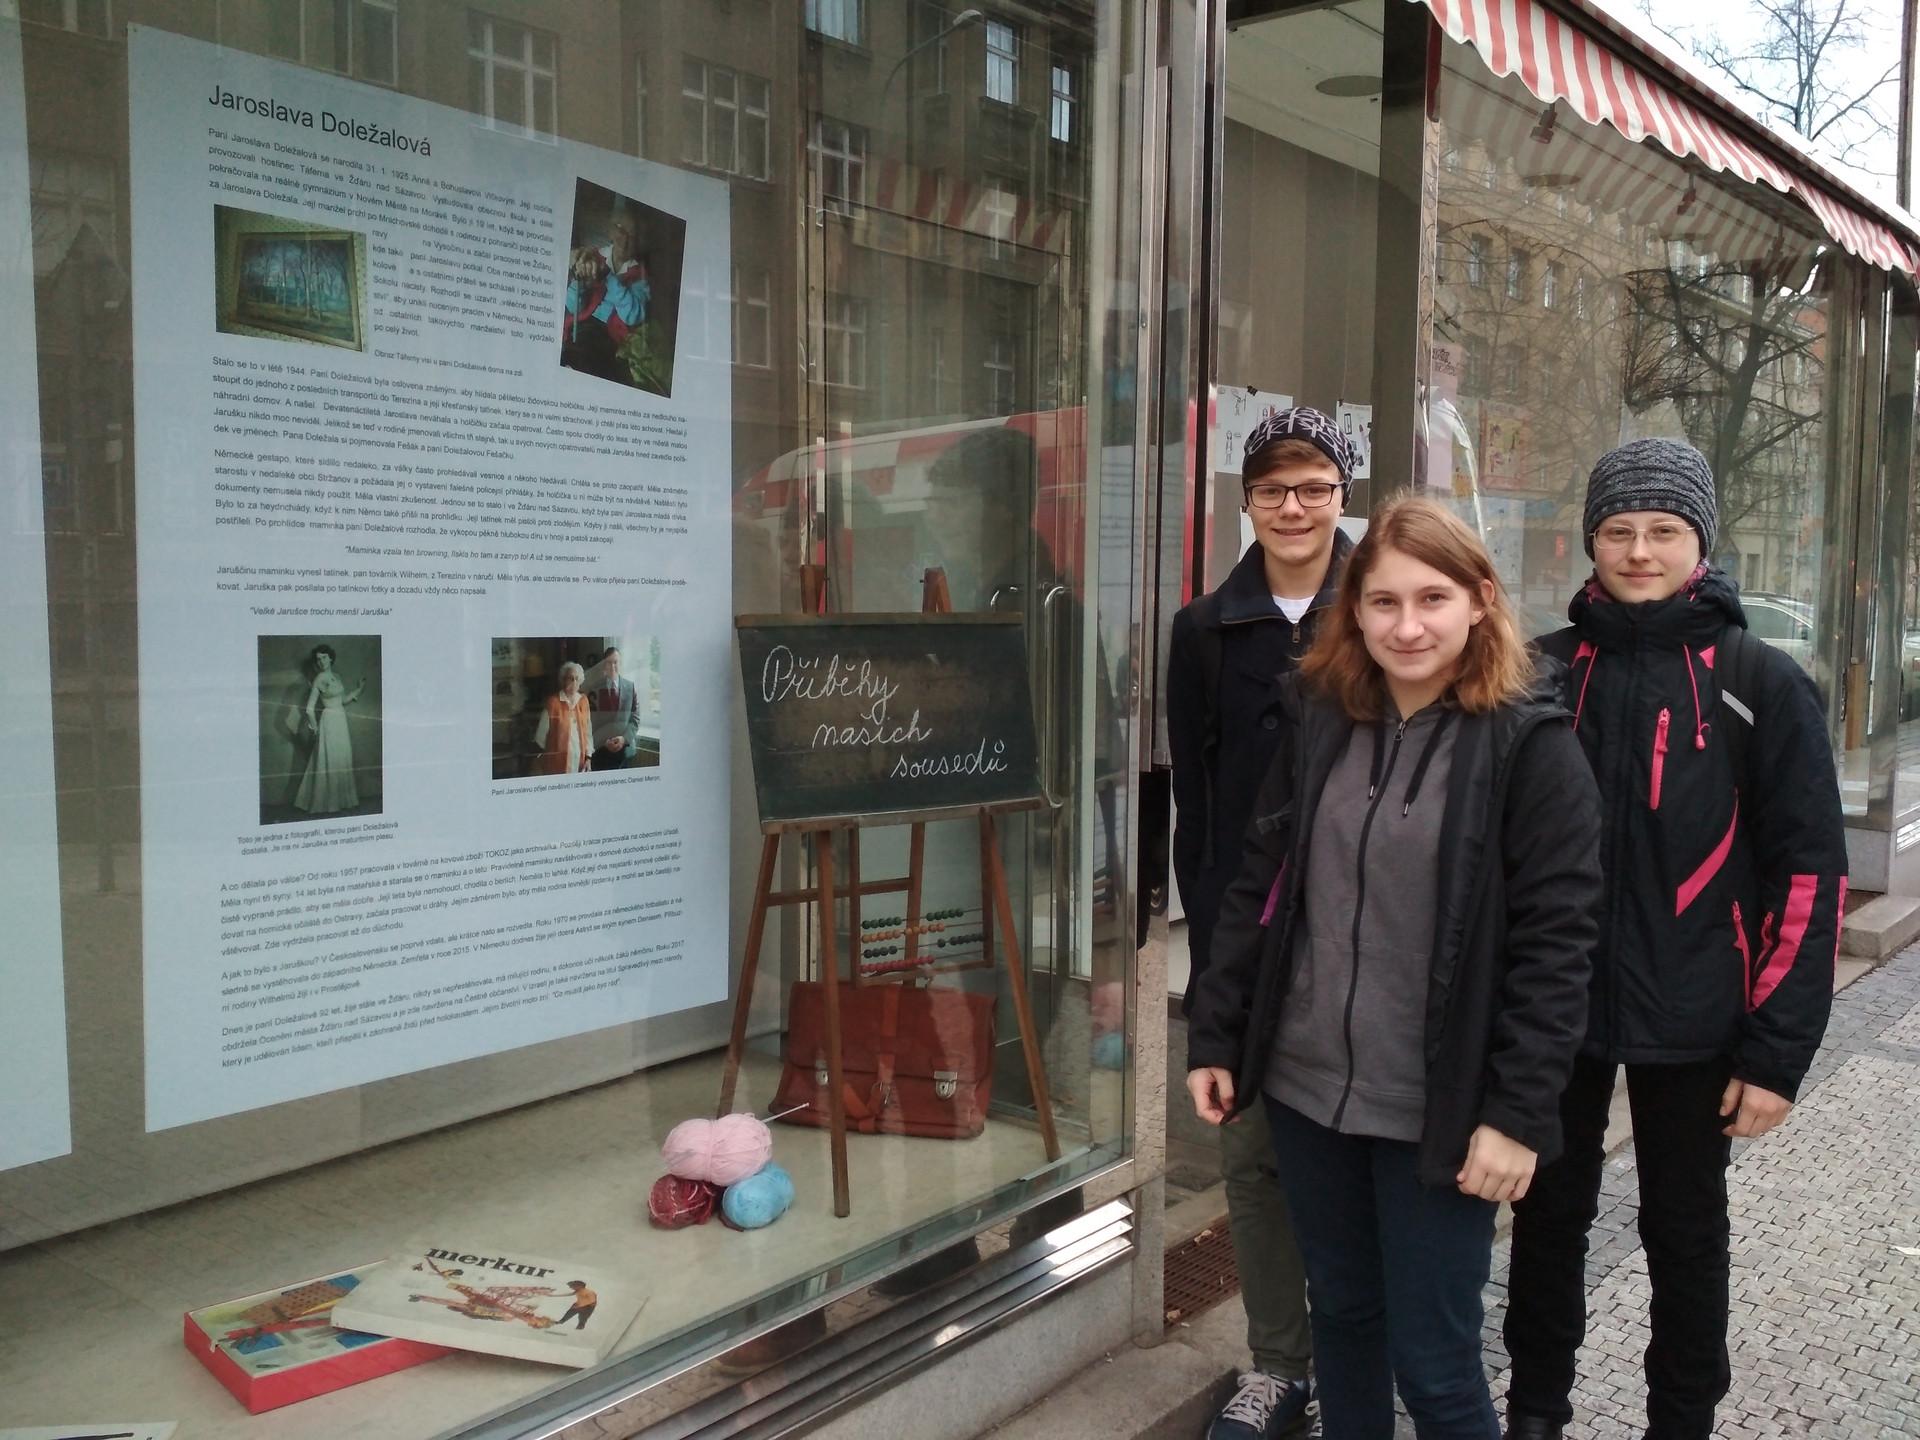 Team with exhibition about Jarmila Dolezalova